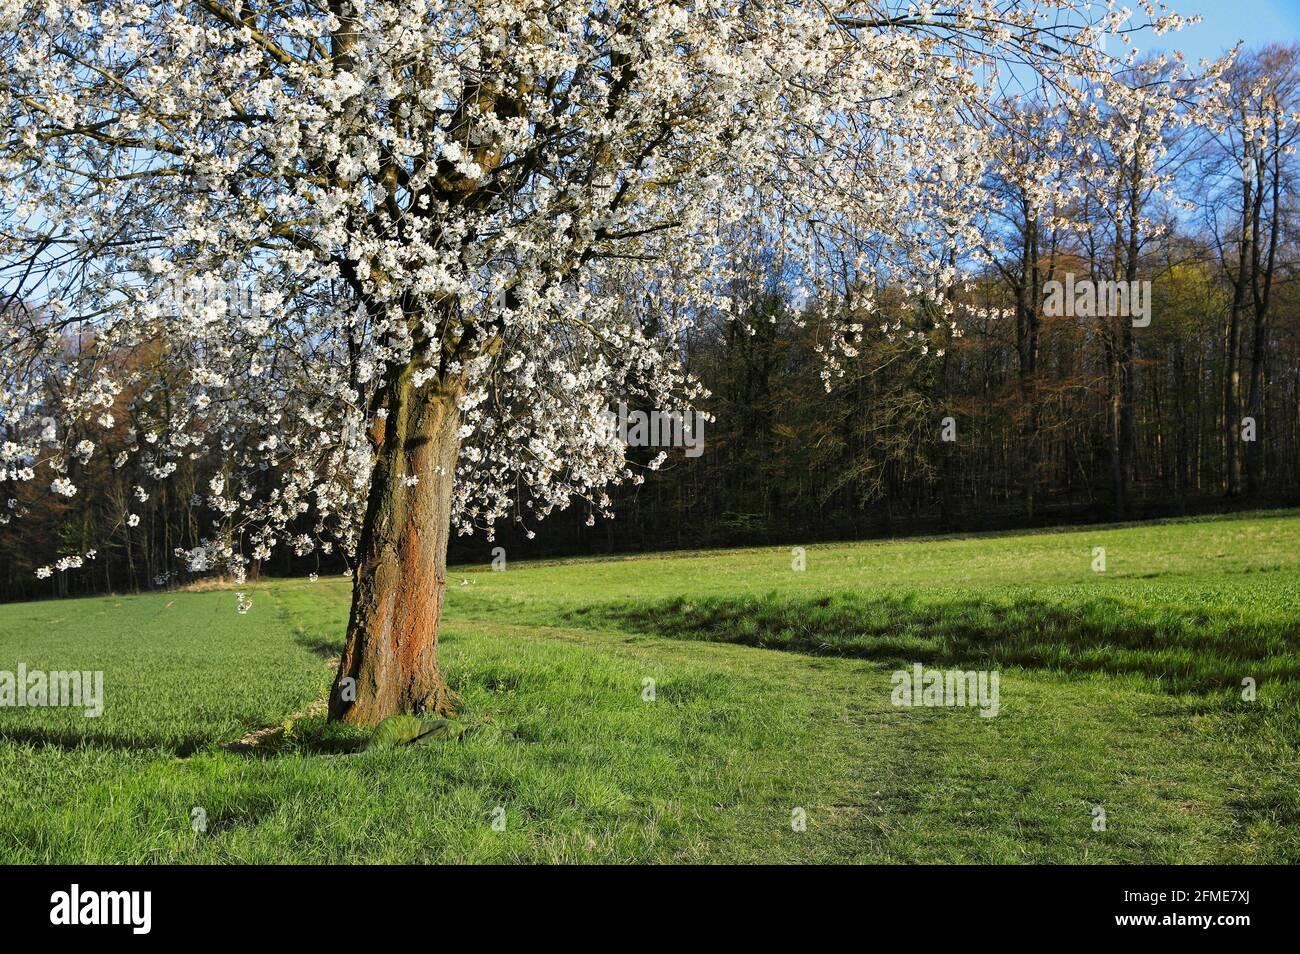 Natura Arte: Cherry Blossom photoshooting con modello Lana come bodypainting erba a Groeninger Feld in Hameln, il 5 maggio 2021 - Bodypainting artist: Joerg Duesterwald Foto Stock